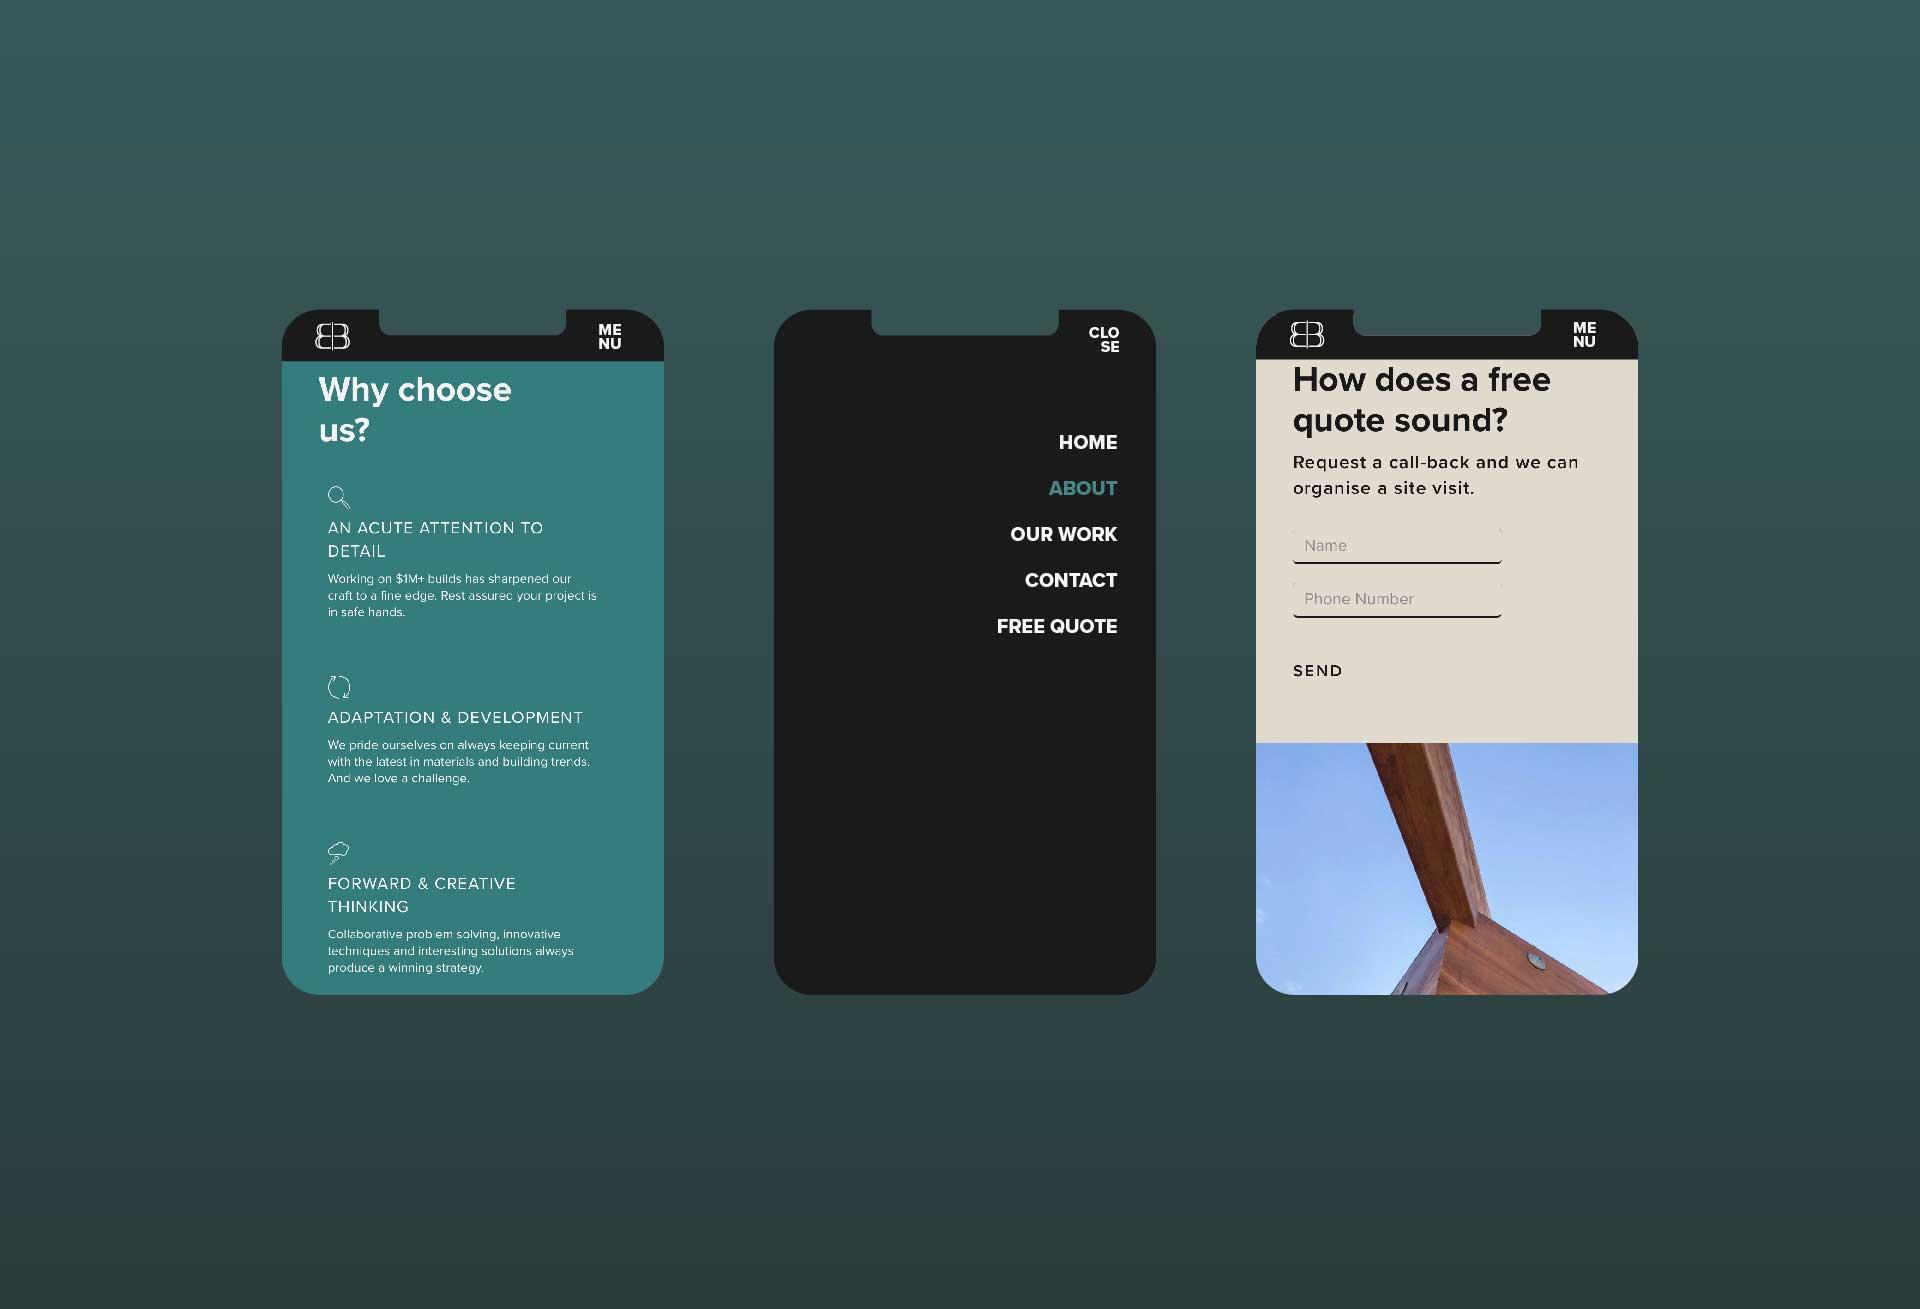 Mobile optimised website design